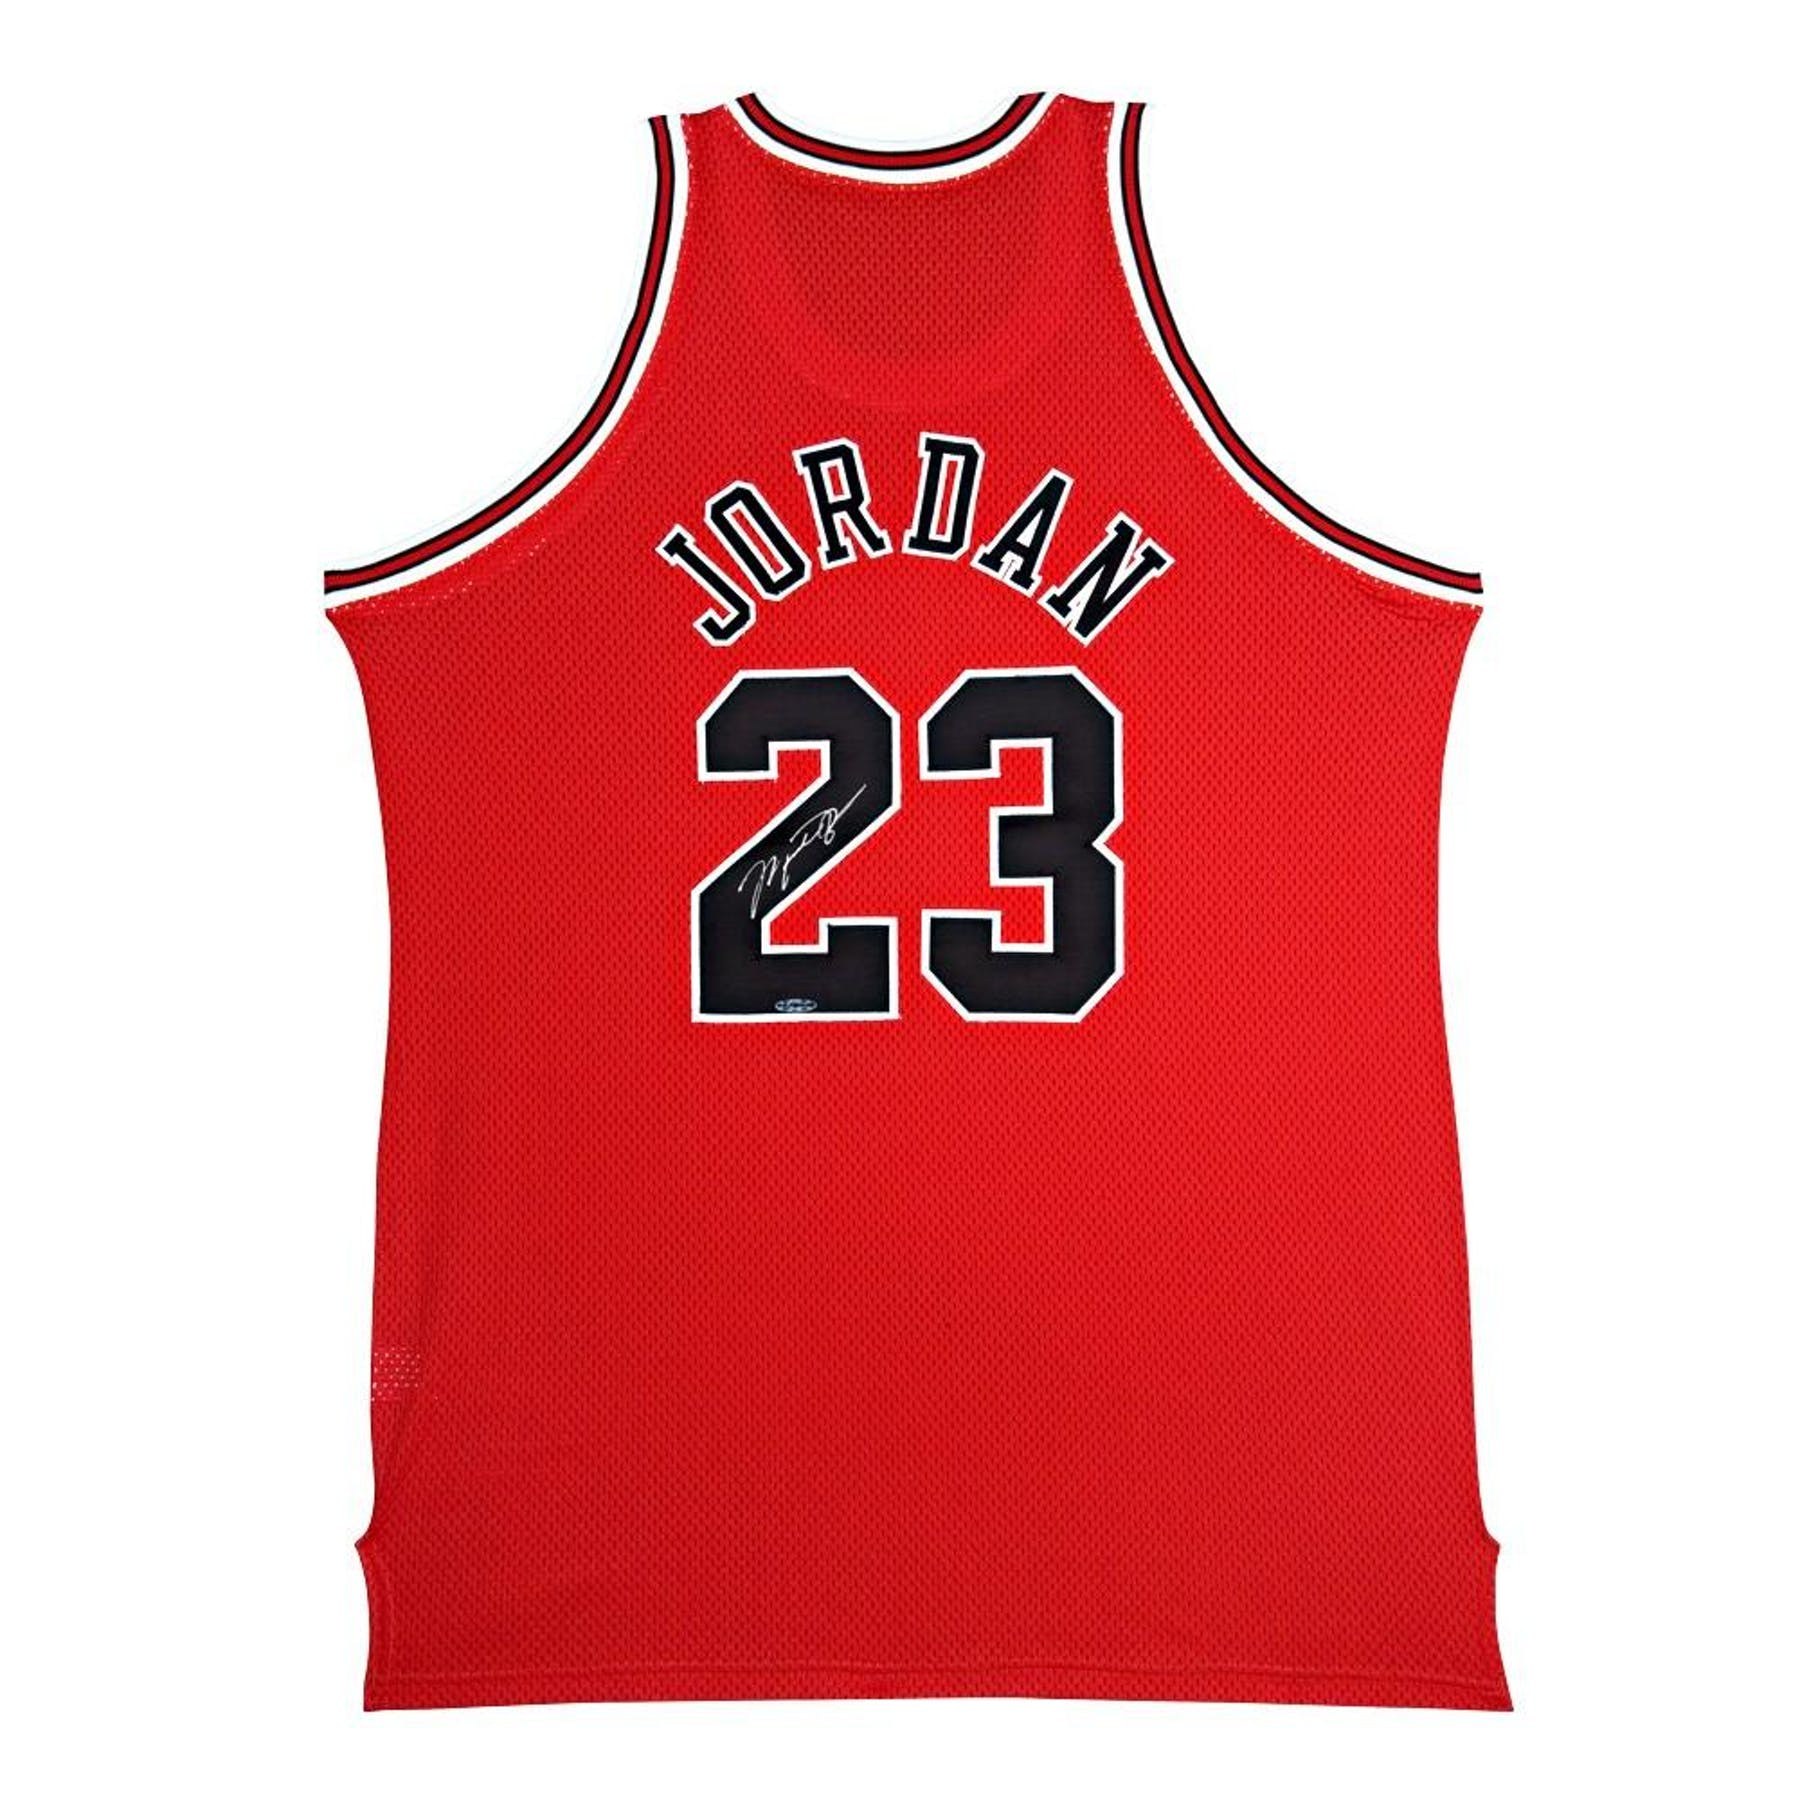 82291c25a Michael Jordan Autographed Chicago Bulls Red Basketball Jersey UDA ...